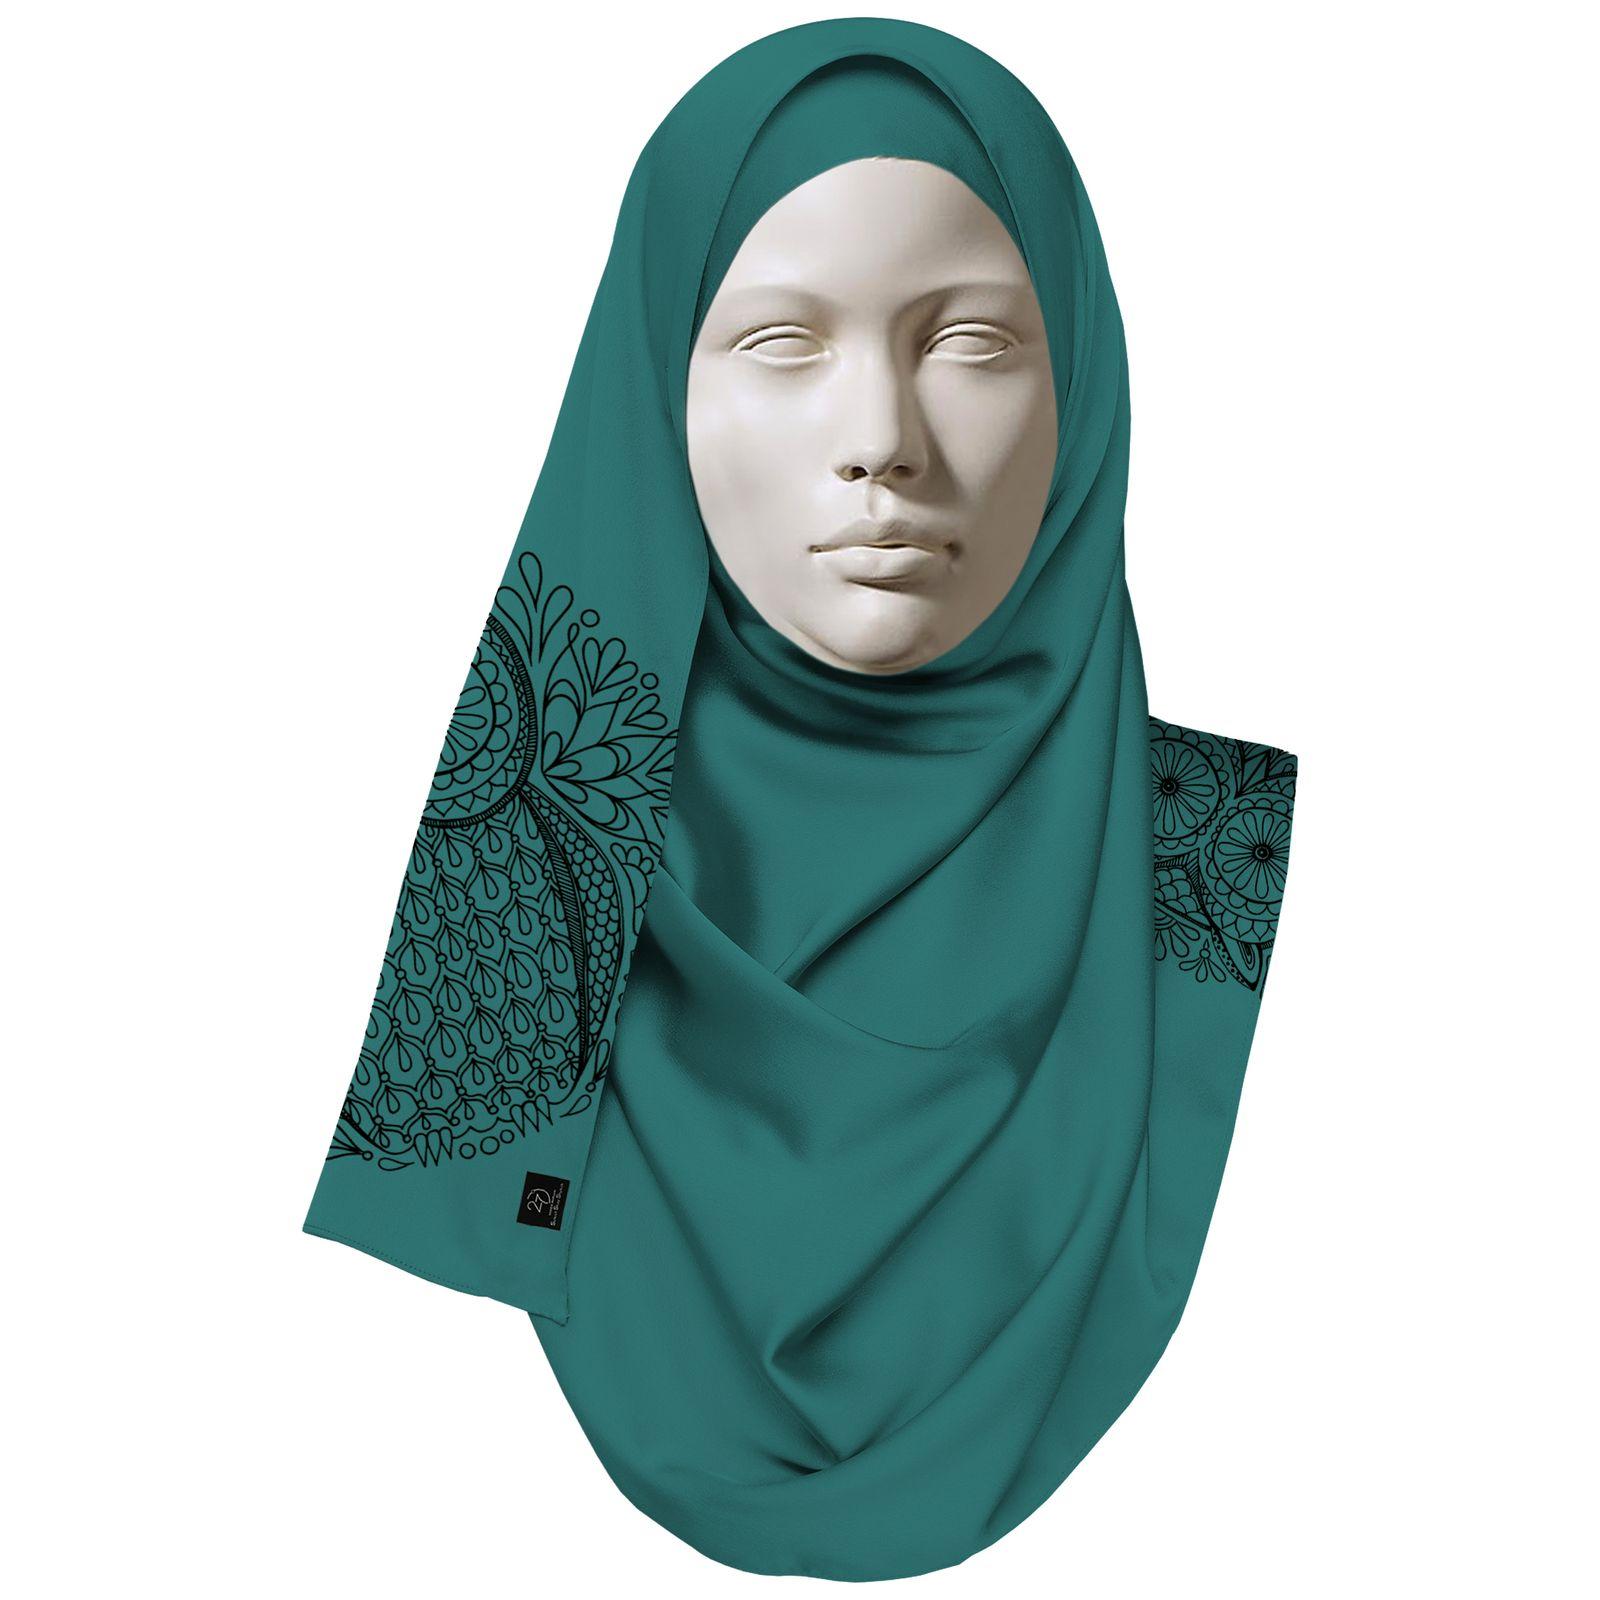 روسری زنانه 27 طرح جغد کد H07 -  - 4